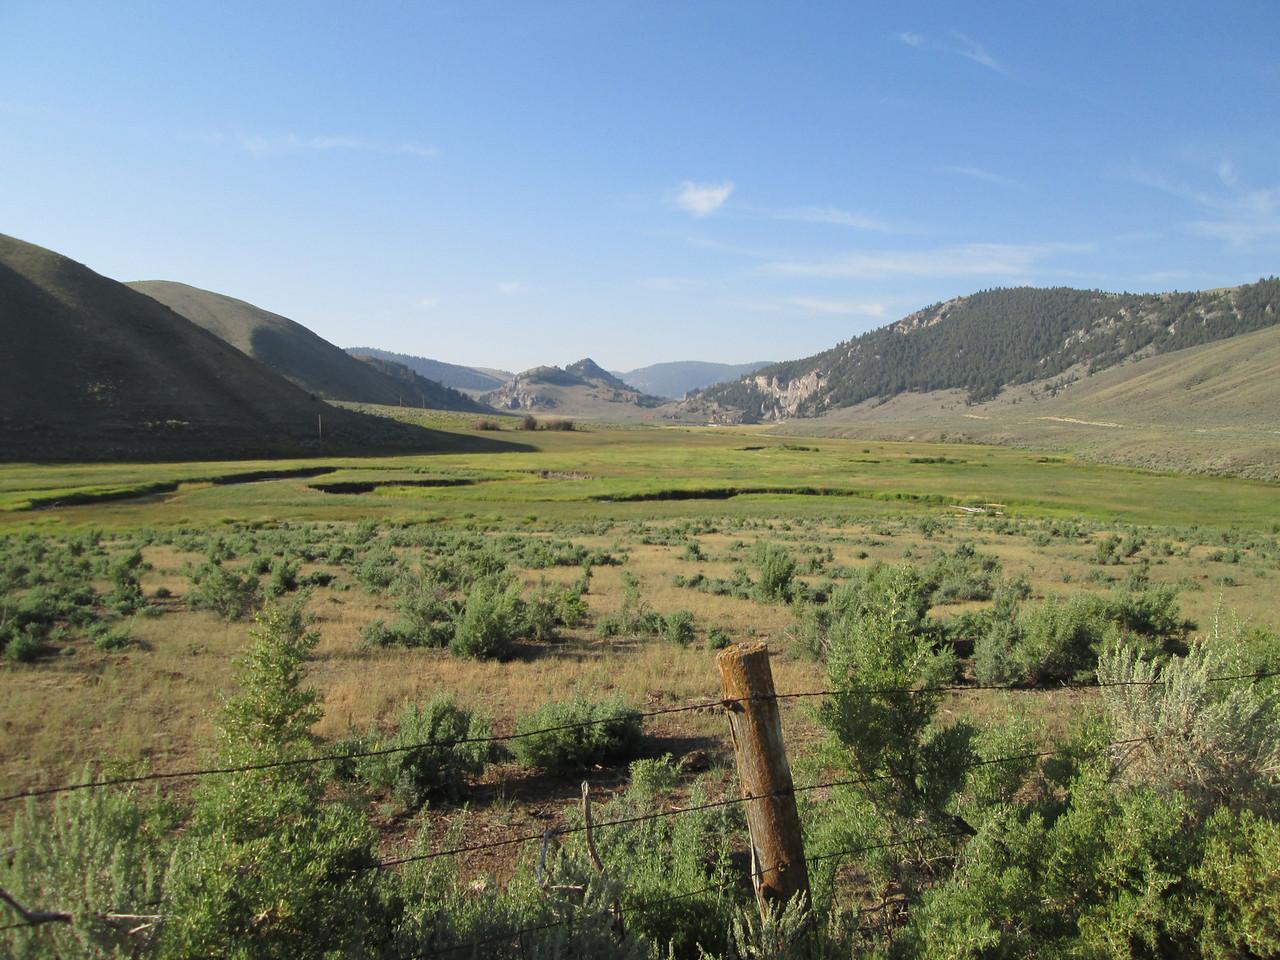 20130815 Green Ranch, Brown Hills